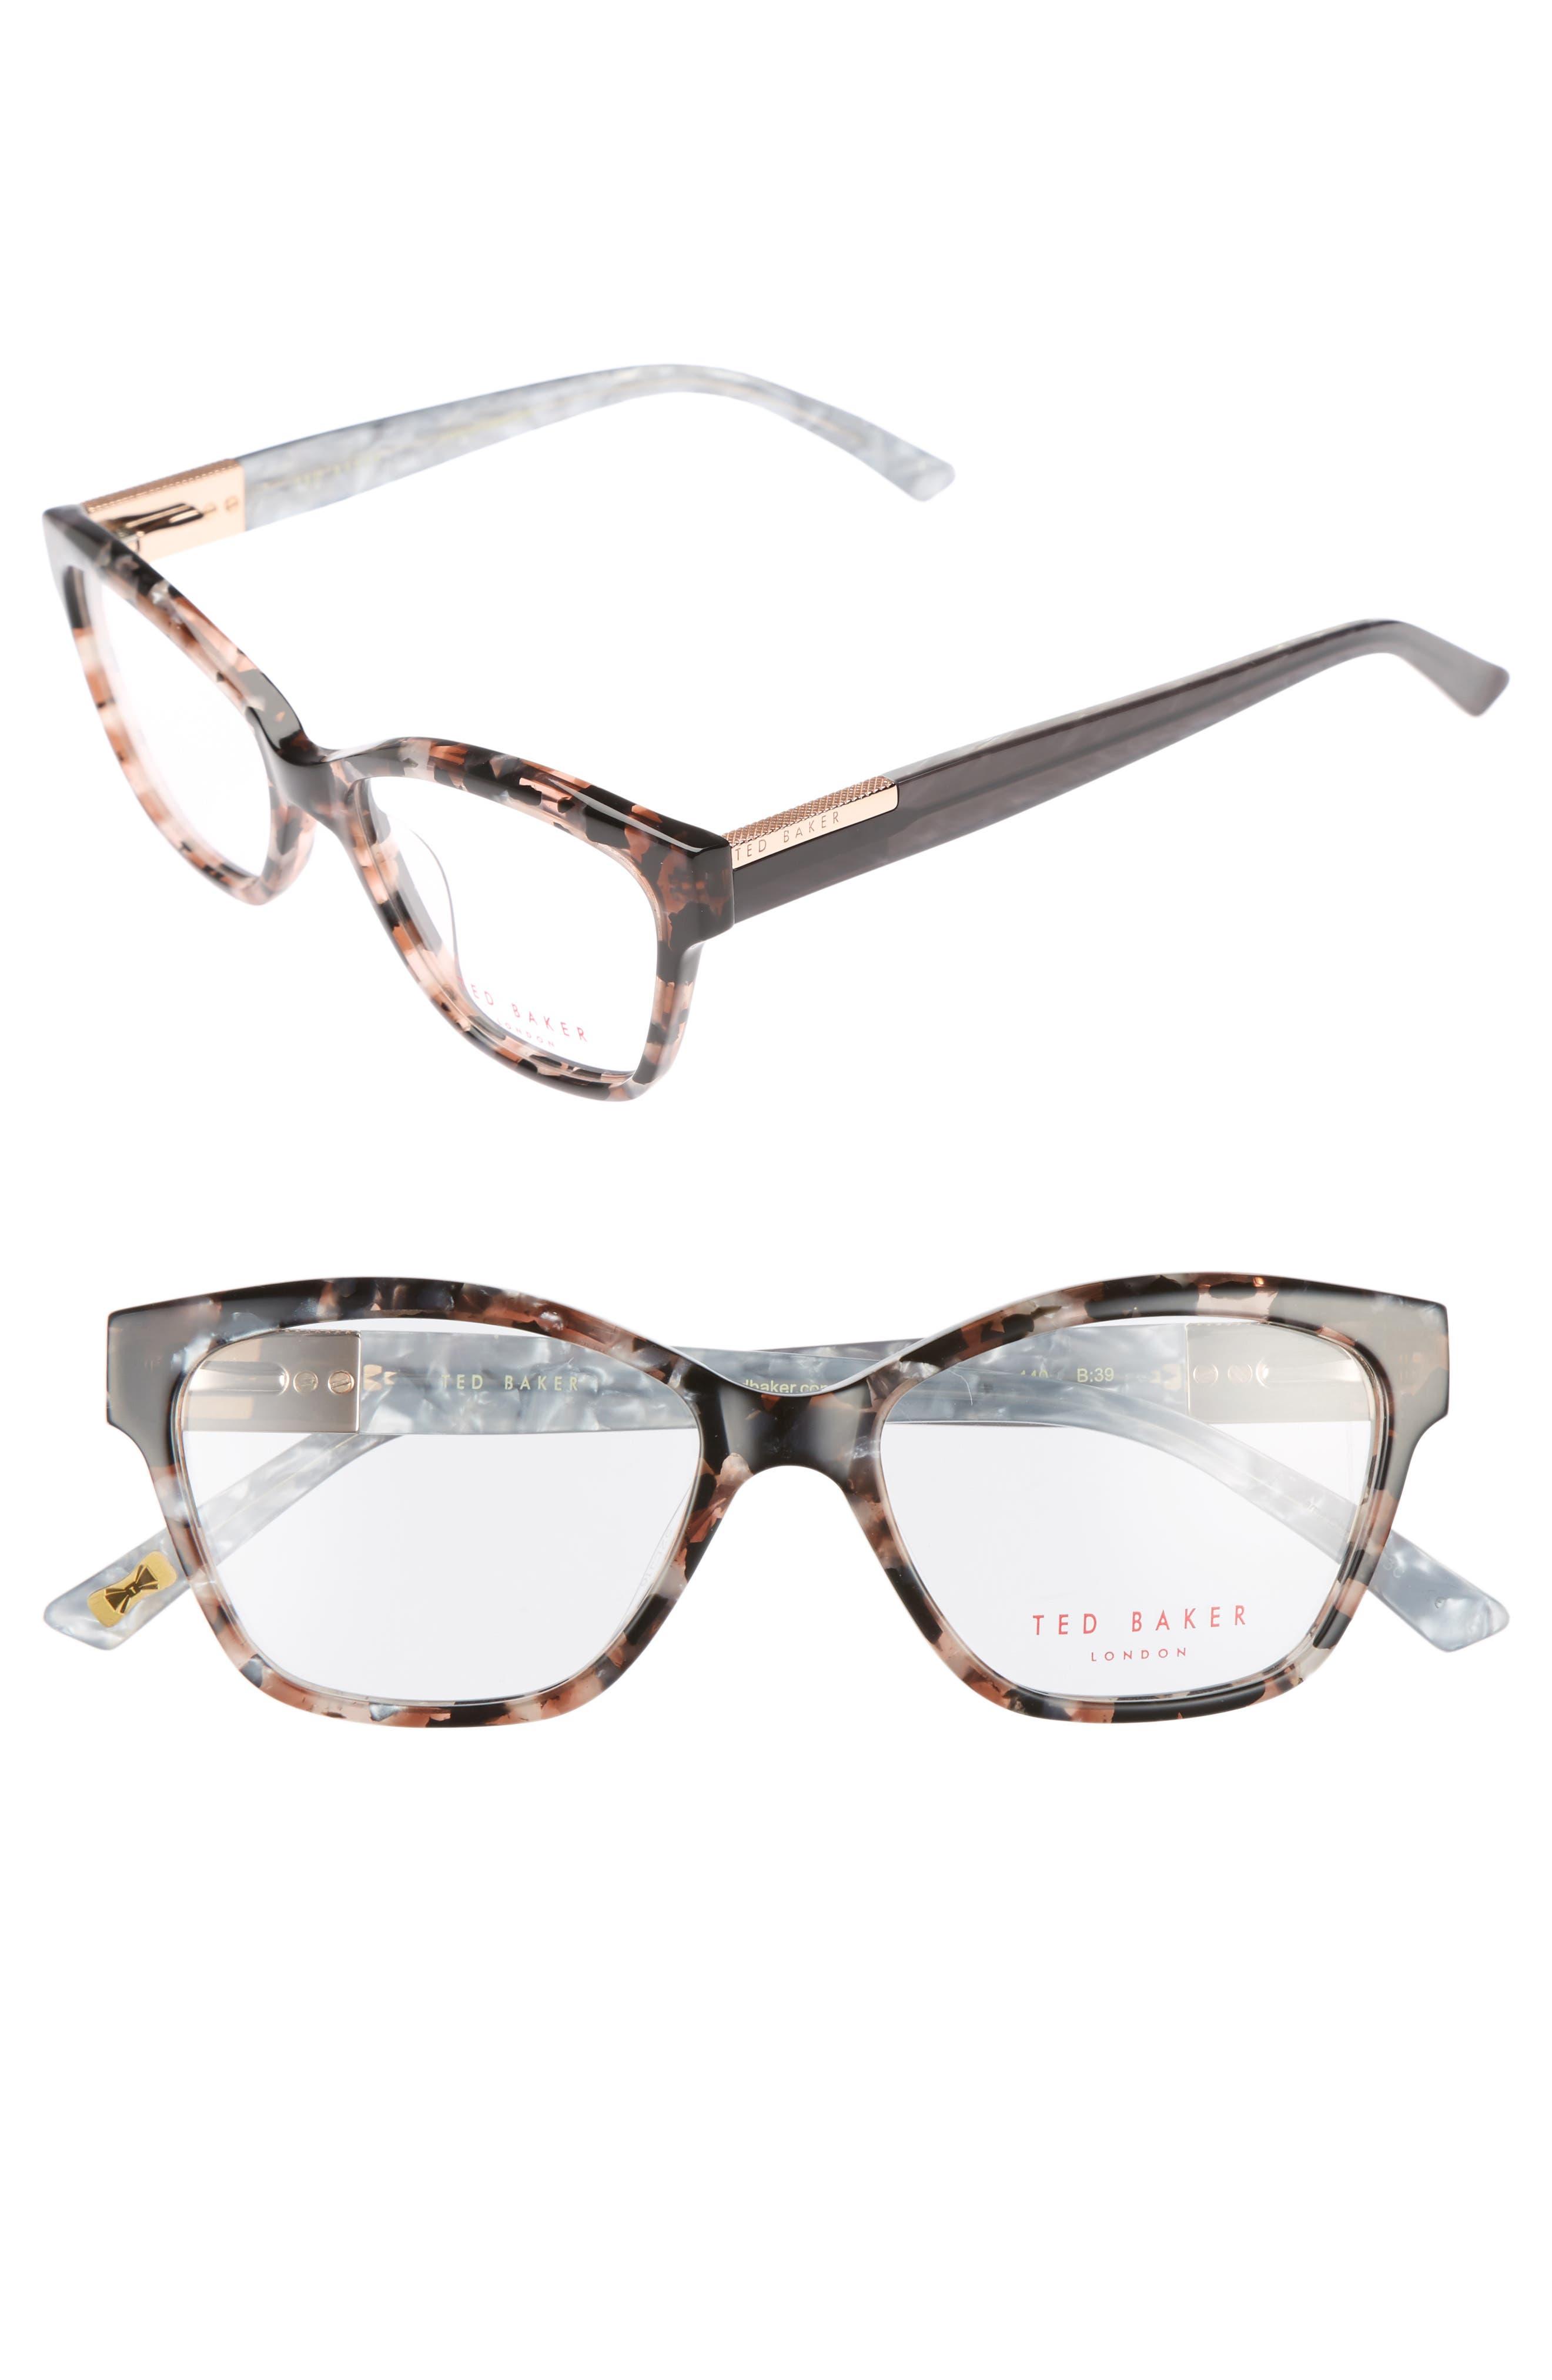 52mm Optical Cat Eye Glasses,                         Main,                         color, Pink